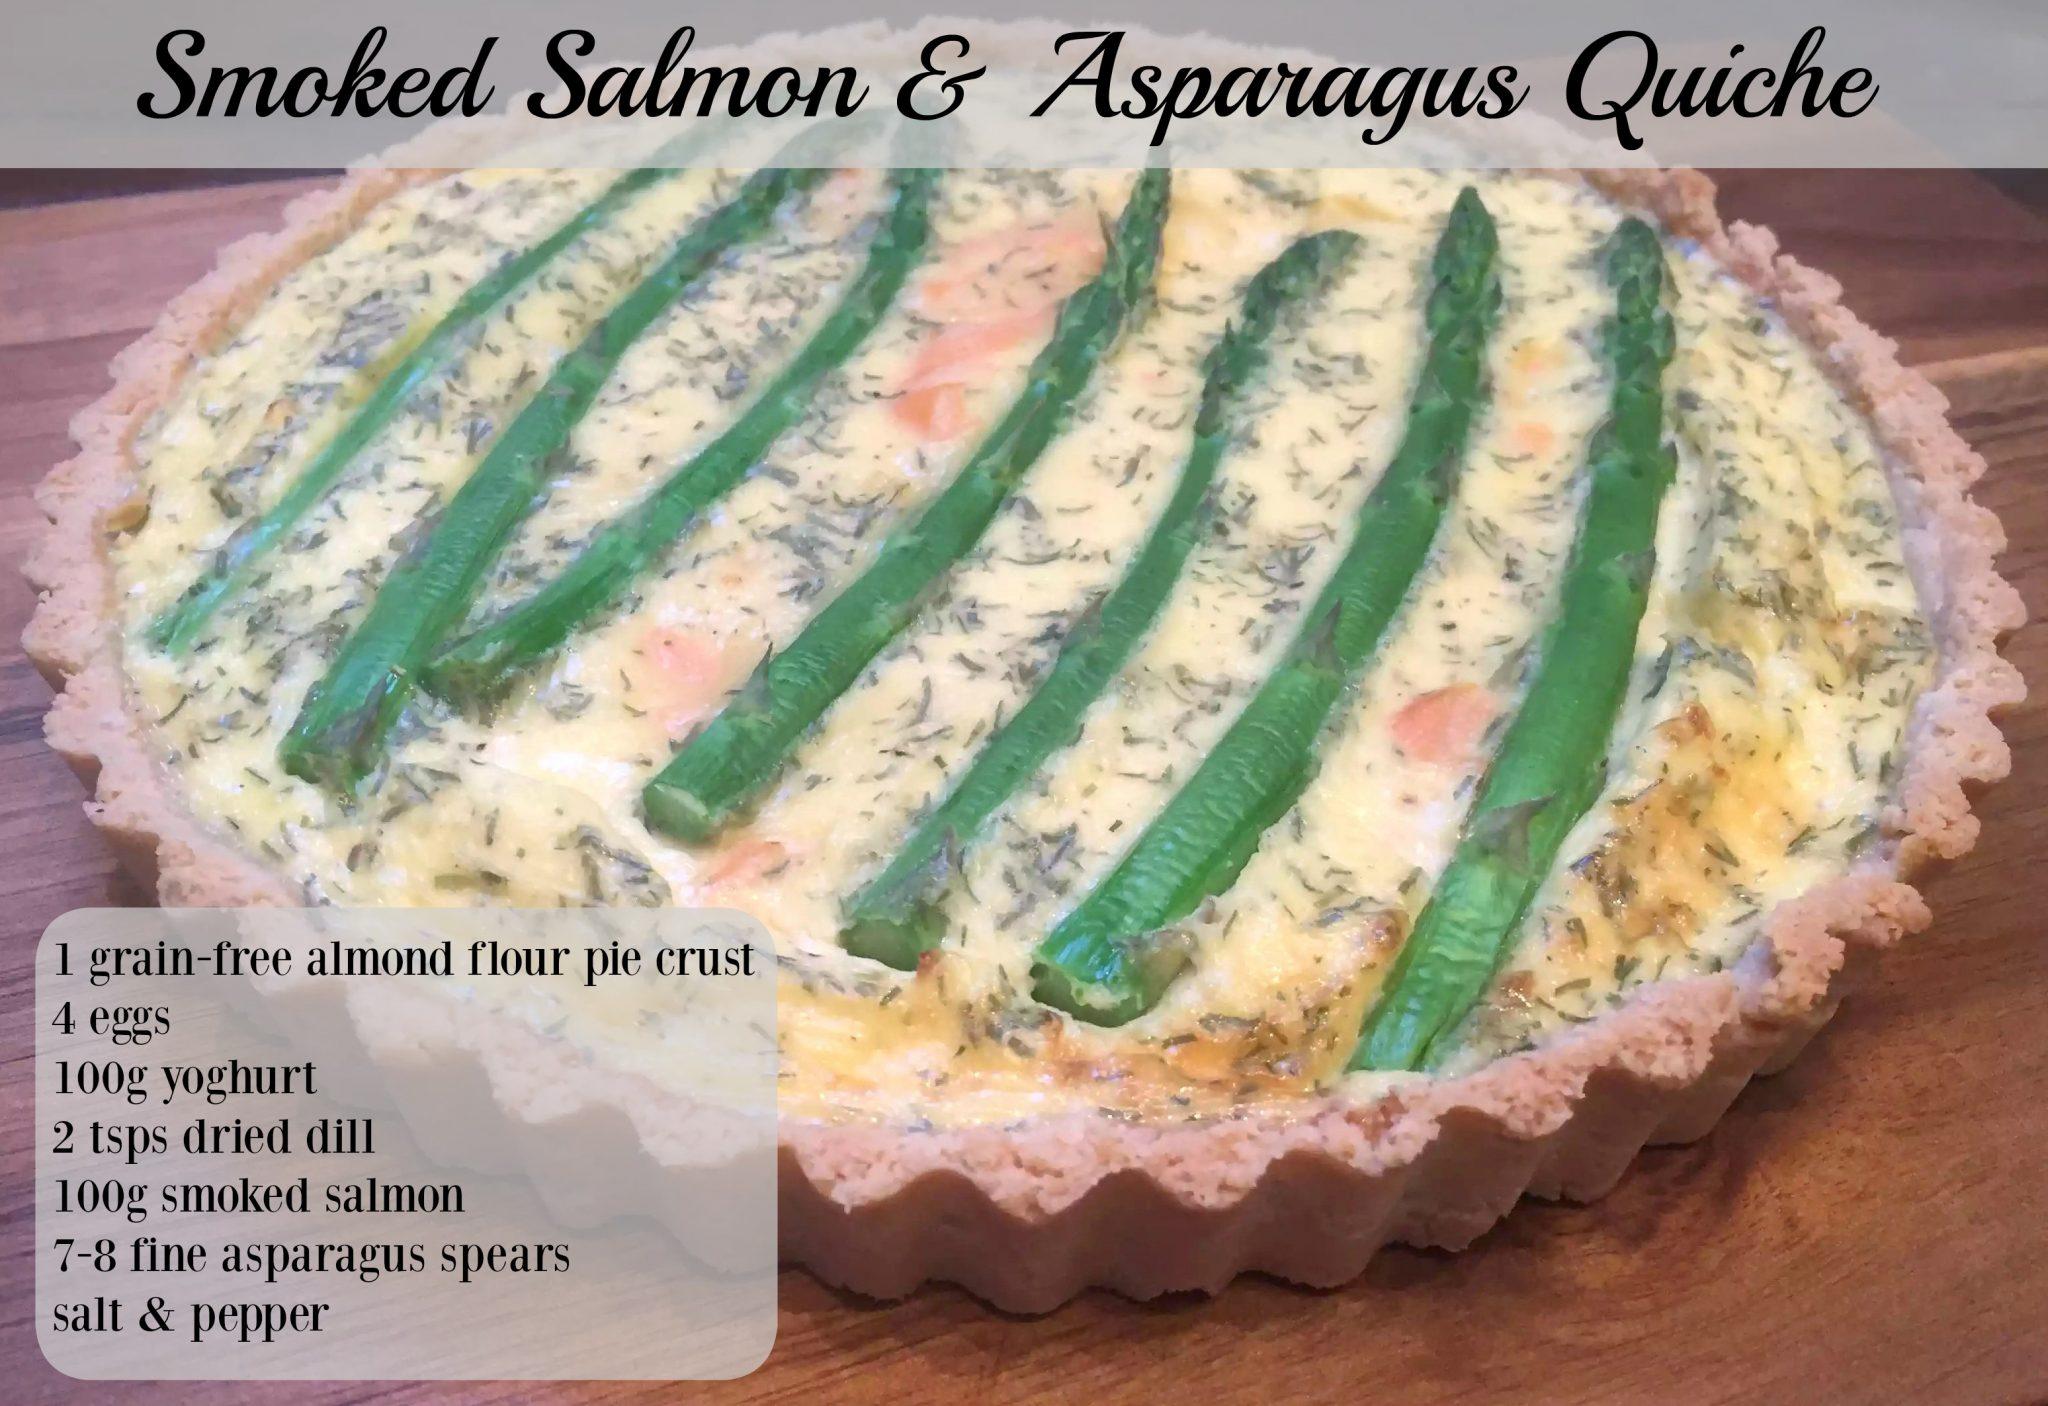 Smoked Salmon & Asparagus Quiche Grain Free Almond Flour Pie Crust Gluten Free SCD Paleo